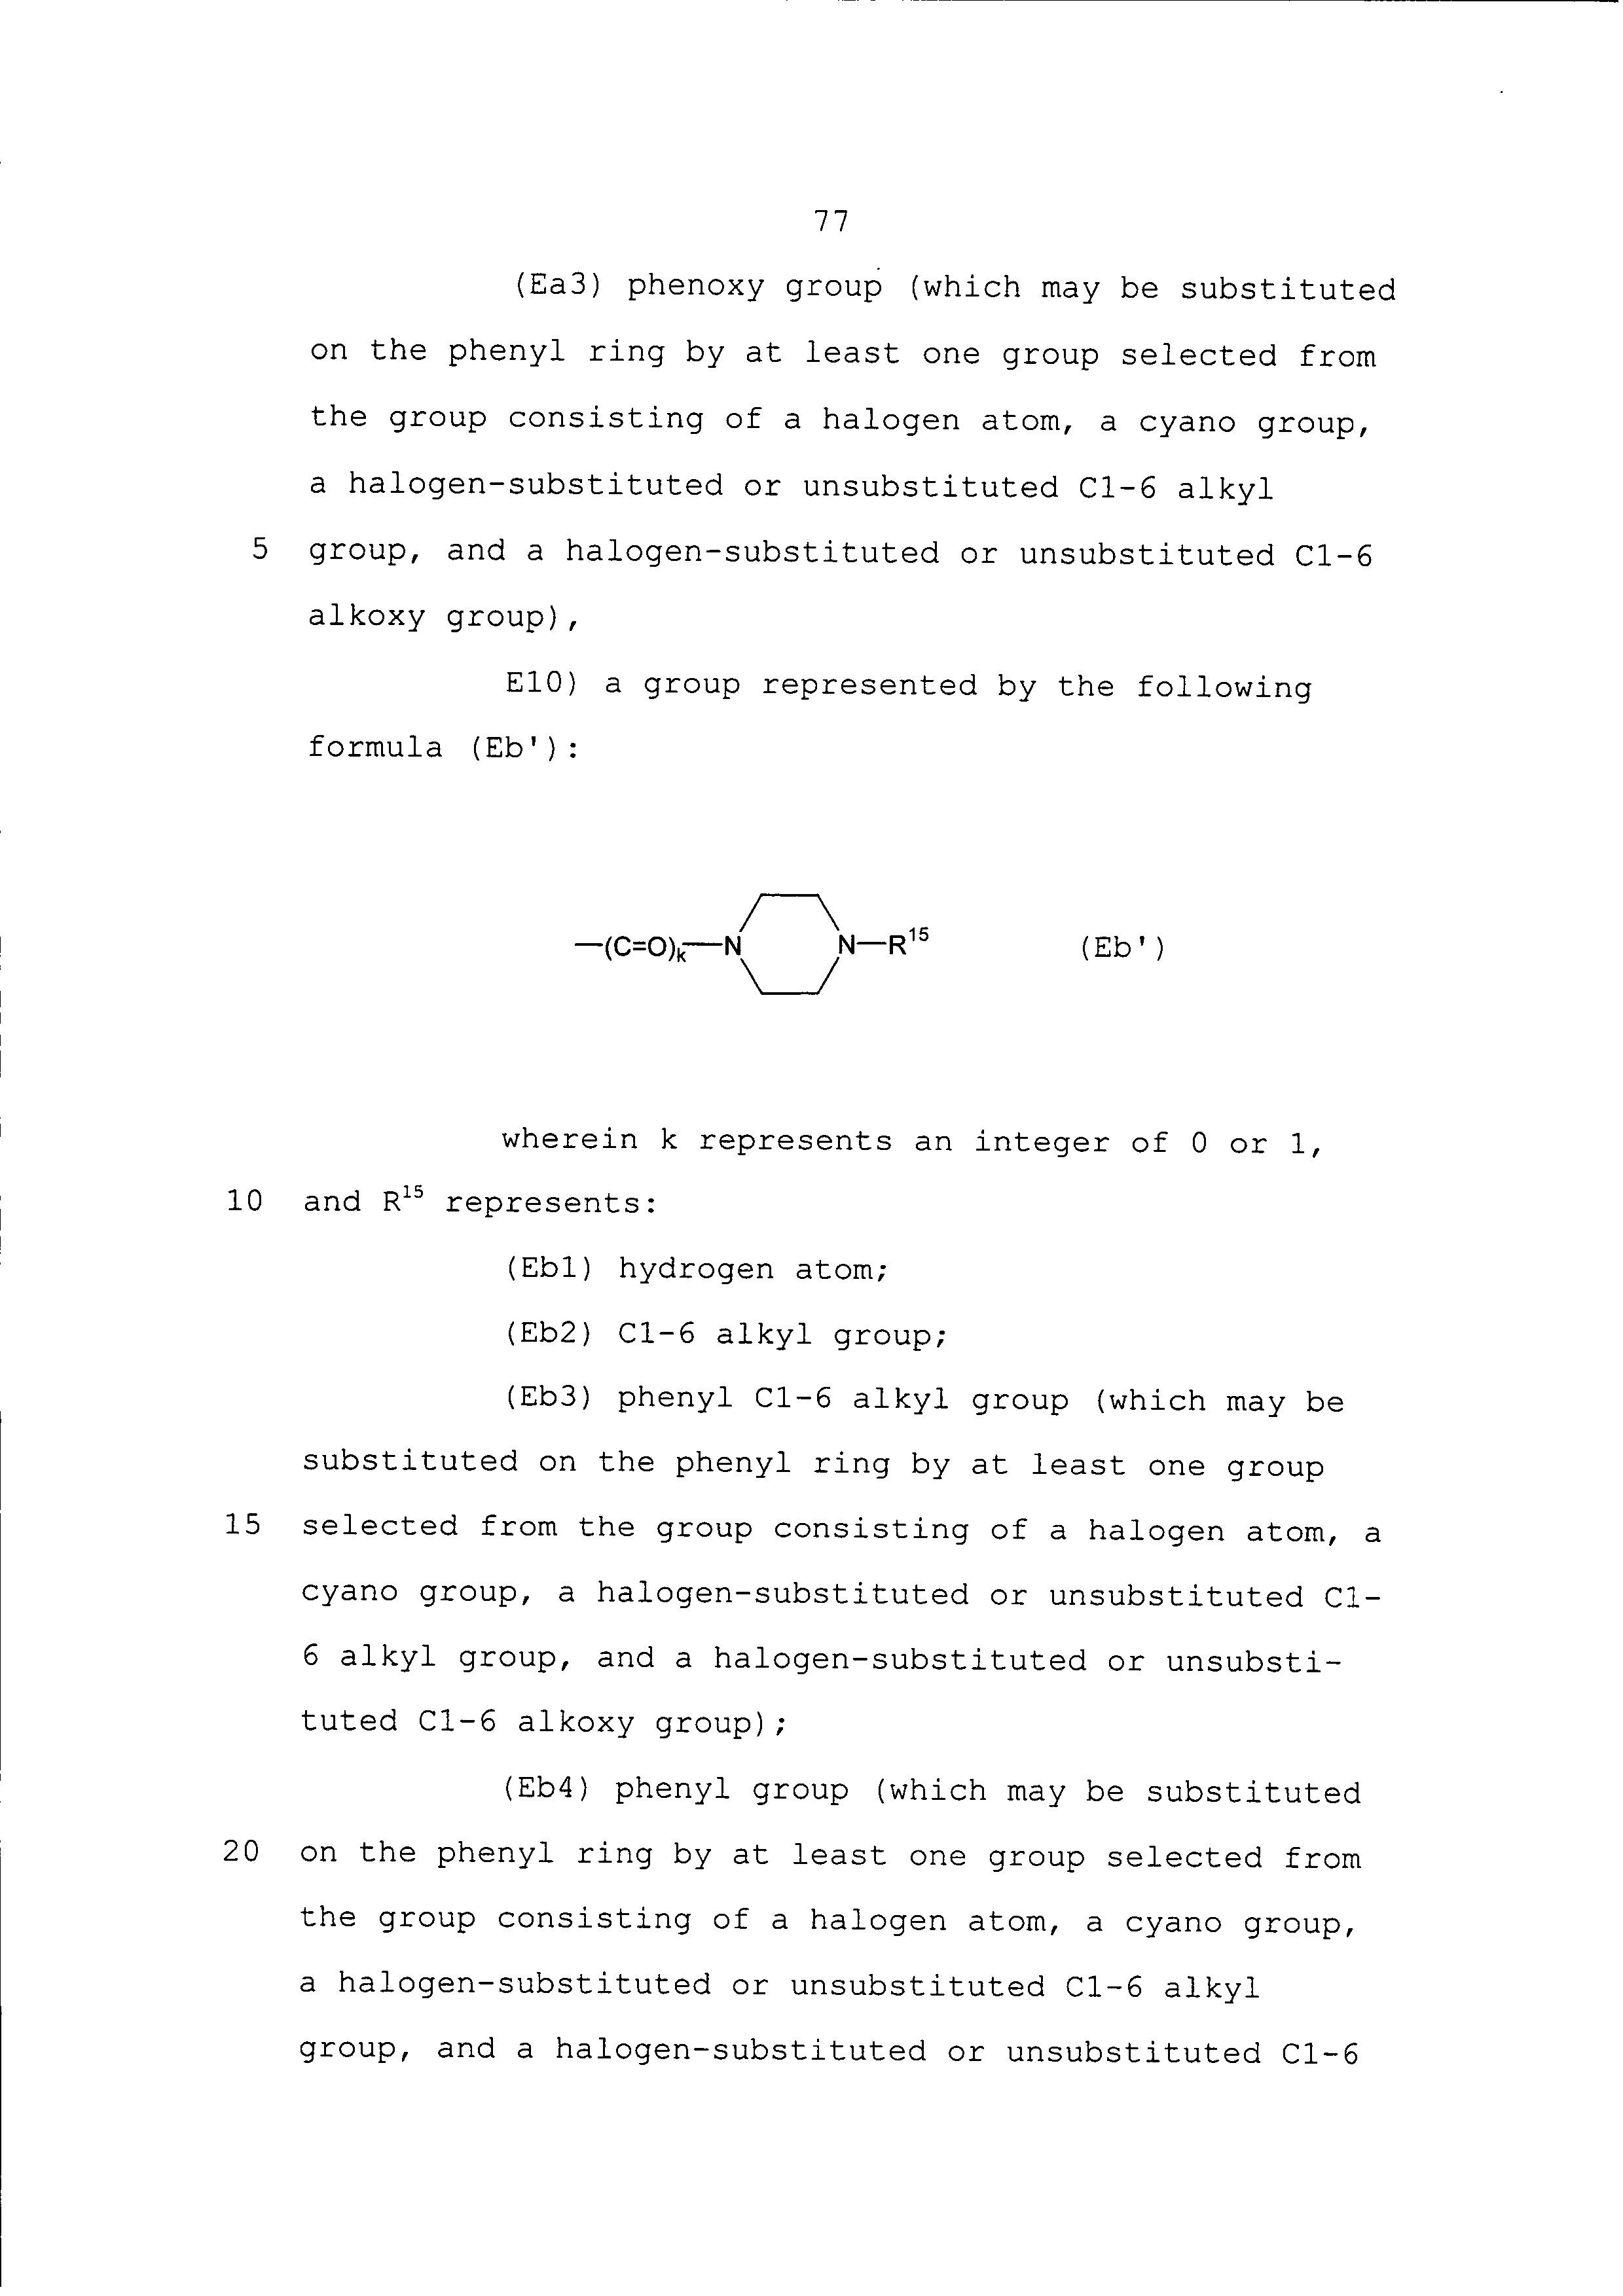 AU 2003/272979 A1 - 2,3-dihydro-6-nitroimidazo(2,1-b)oxazoles - The